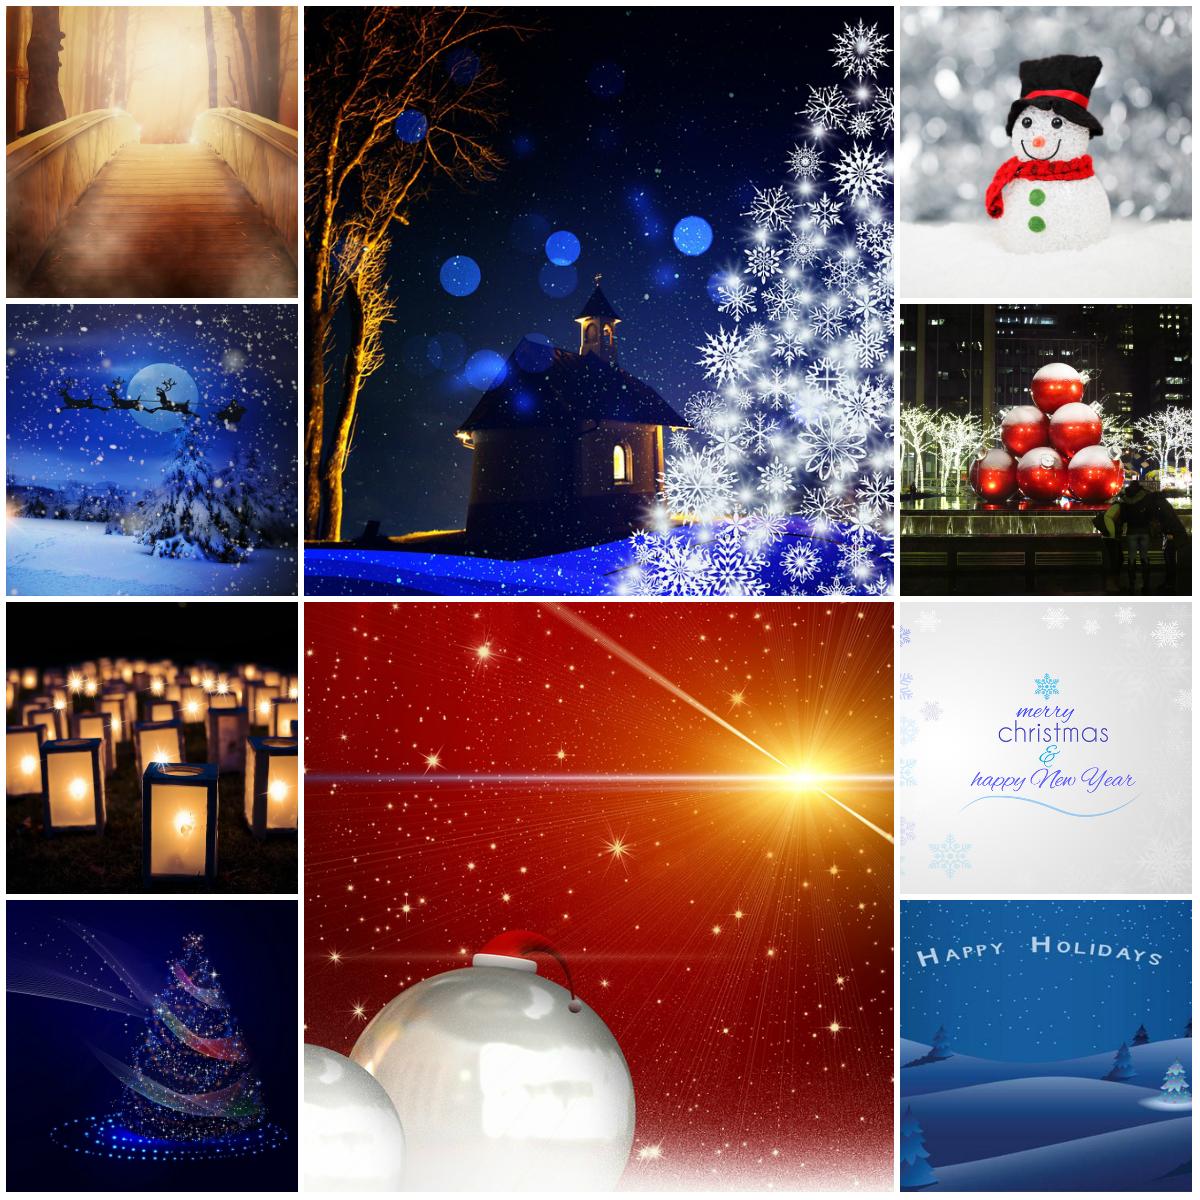 Motivation Mondays: Happy Holiday Wishes & Merry Christmas